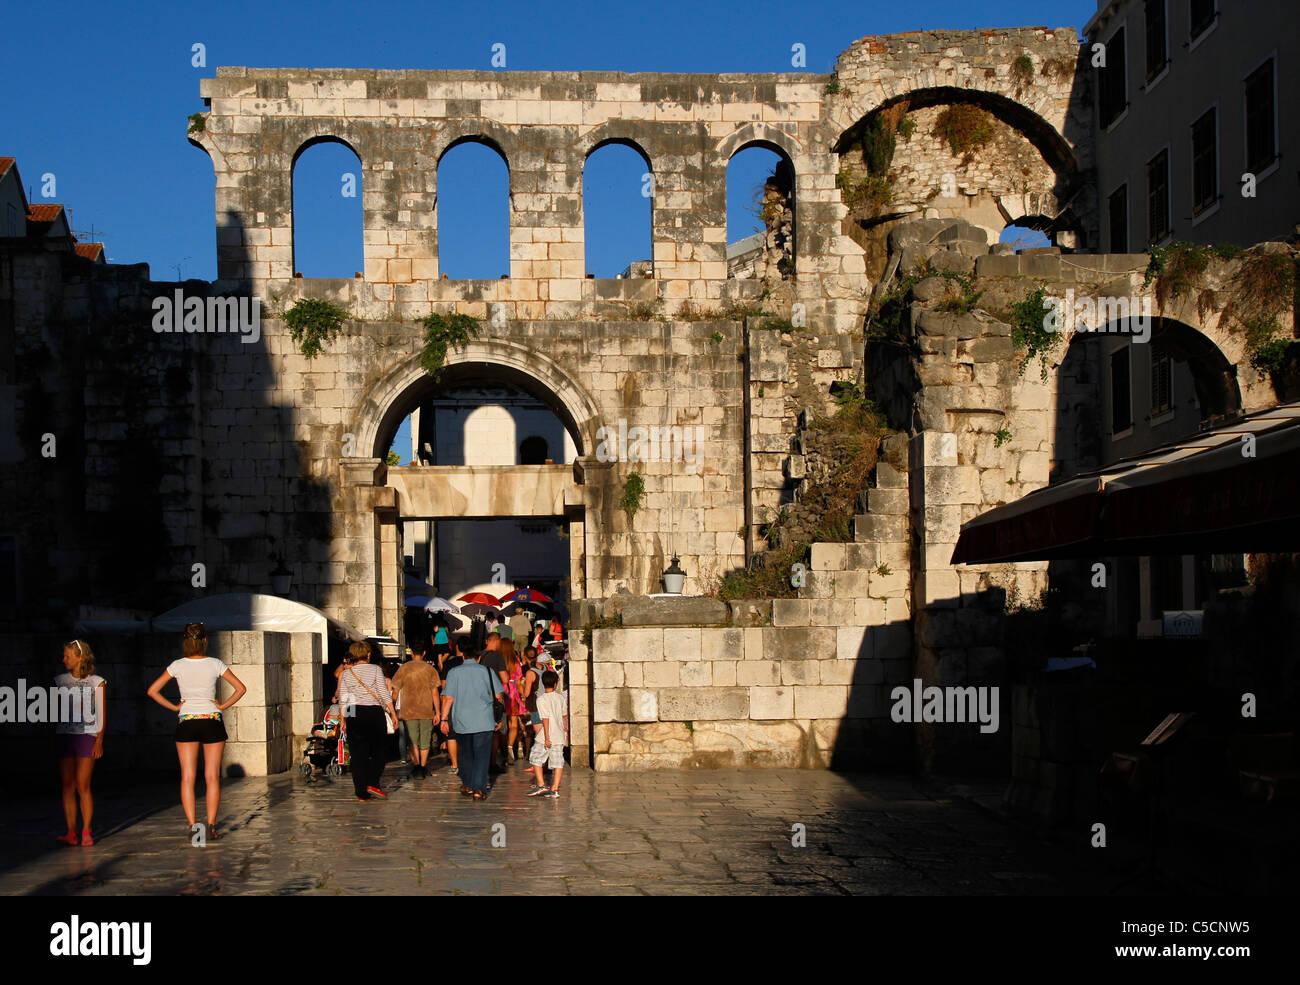 Silver (east) gate - Porta argentea - Diocletian's Palace, Split, Croatia Stock Photo